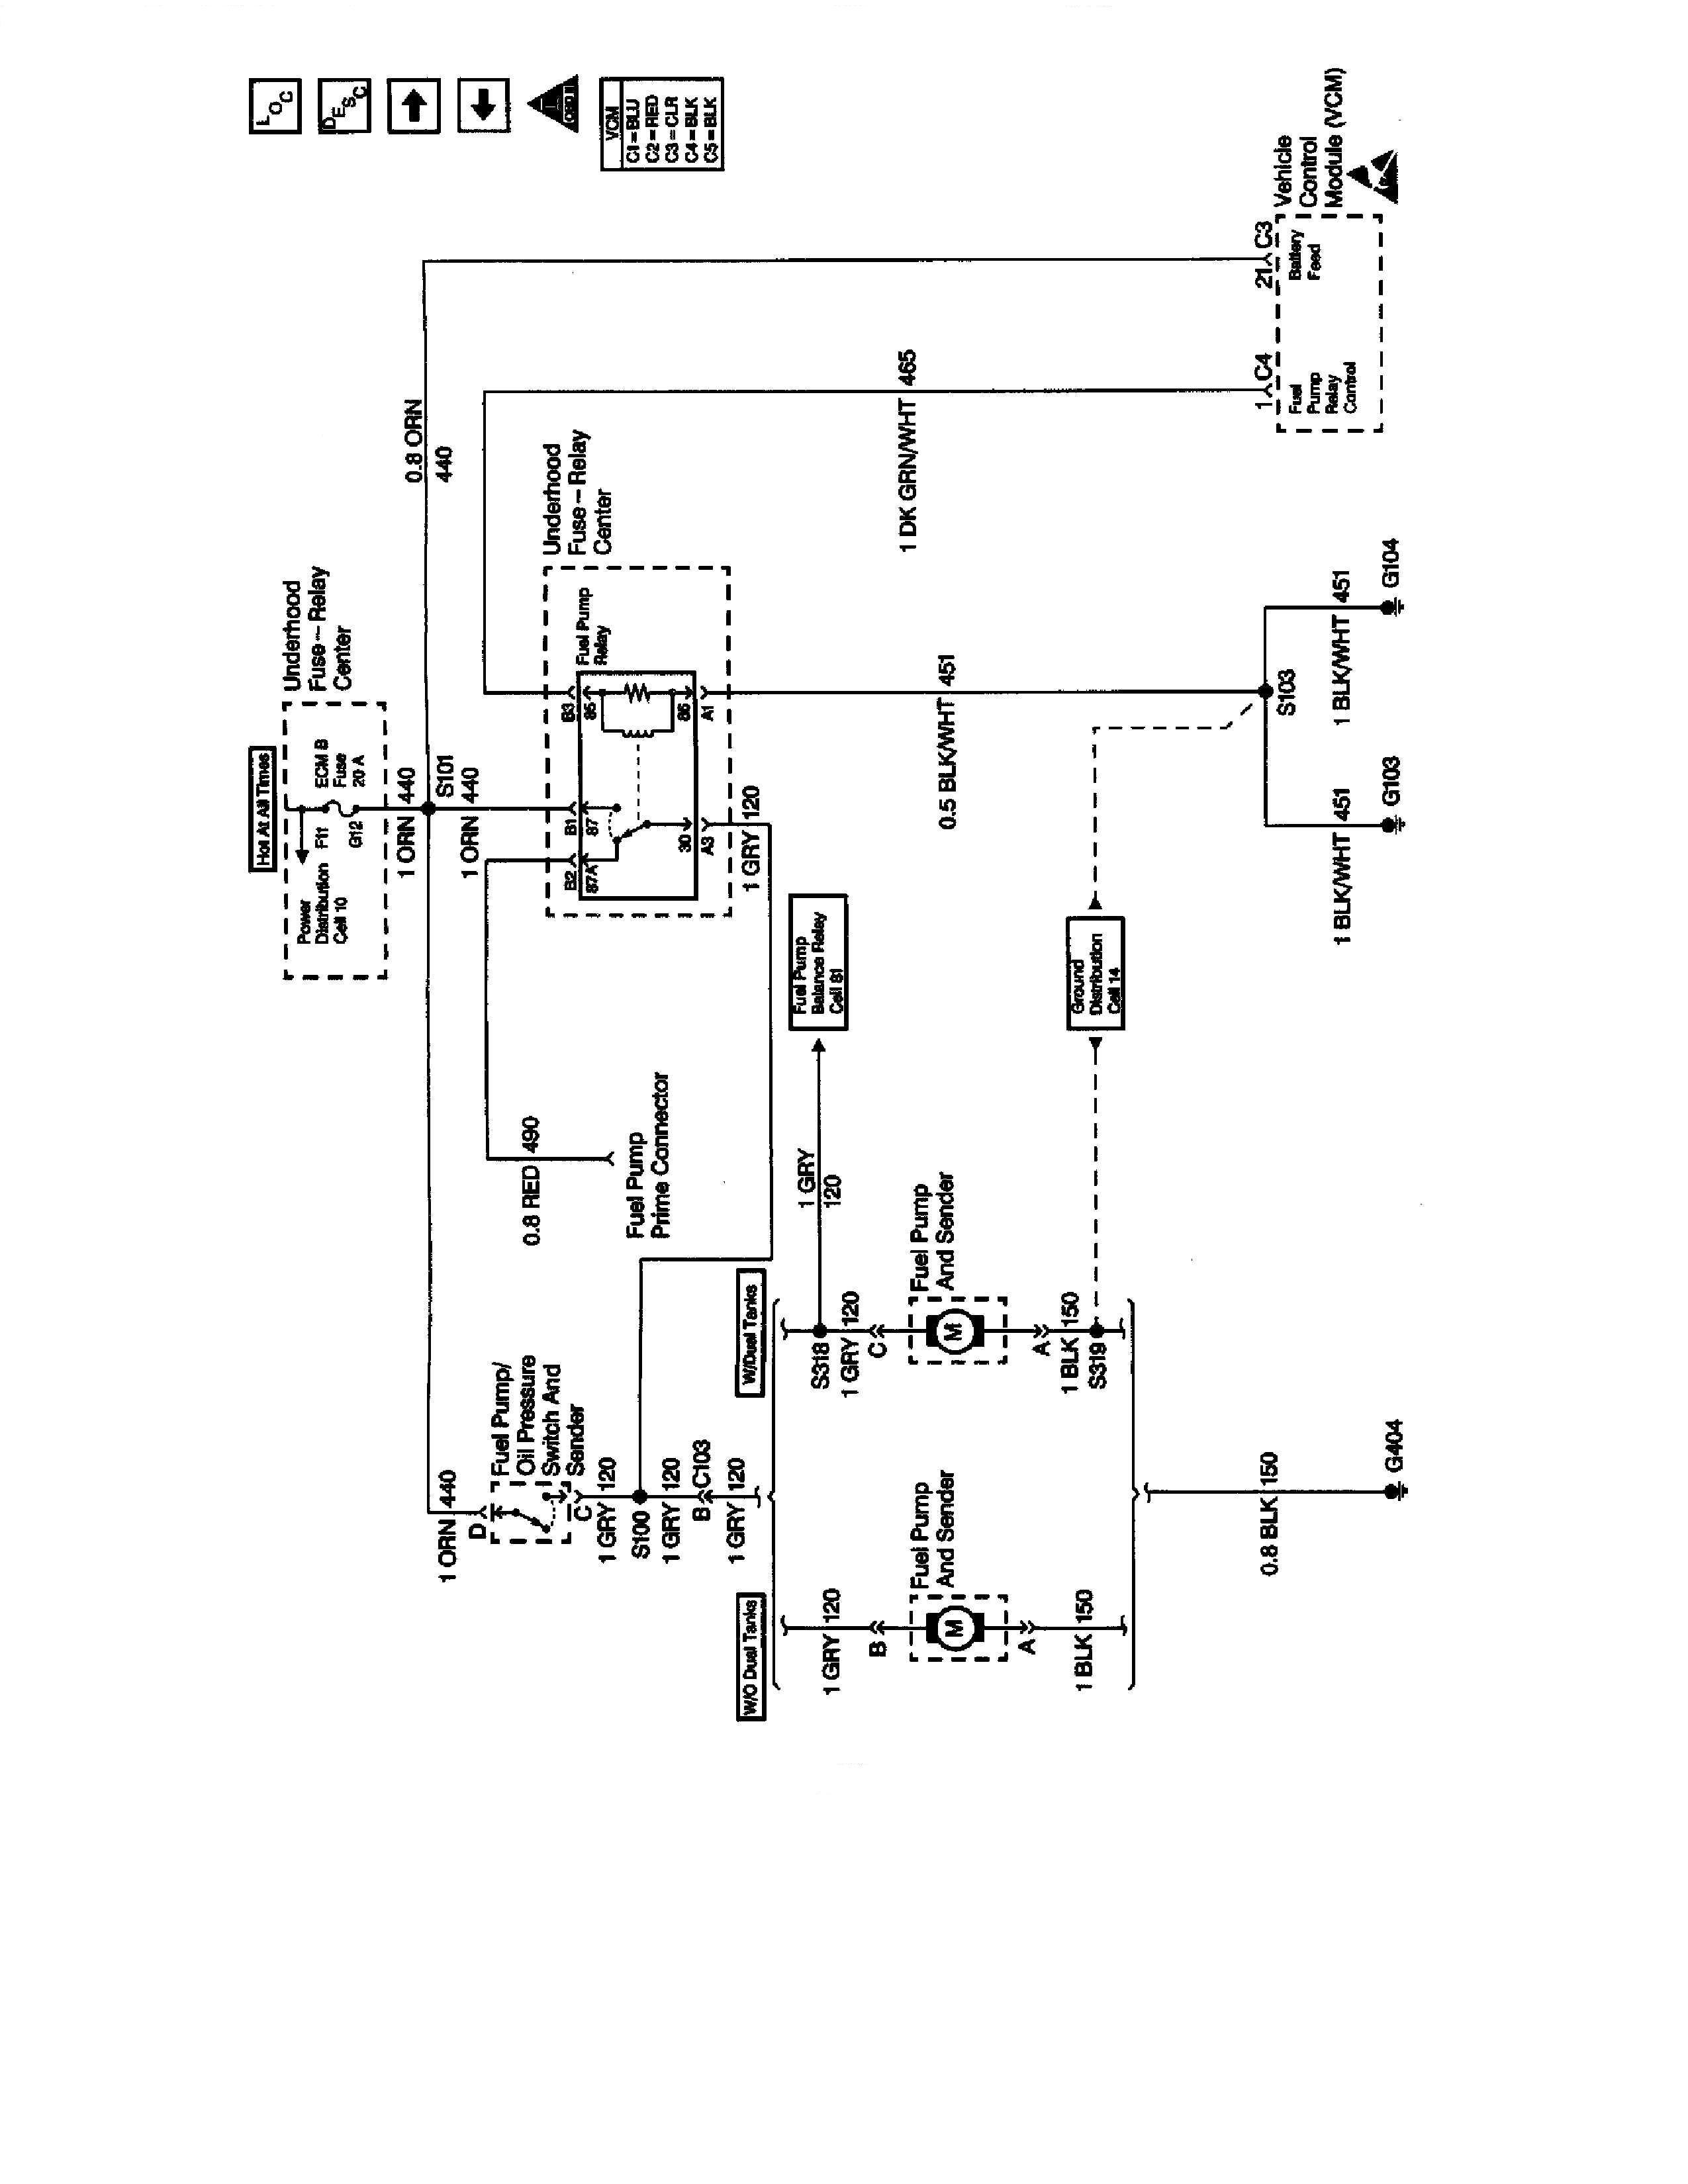 I have a 1998 GMC k1500 5.7L Vortec. The fuel pump started ...